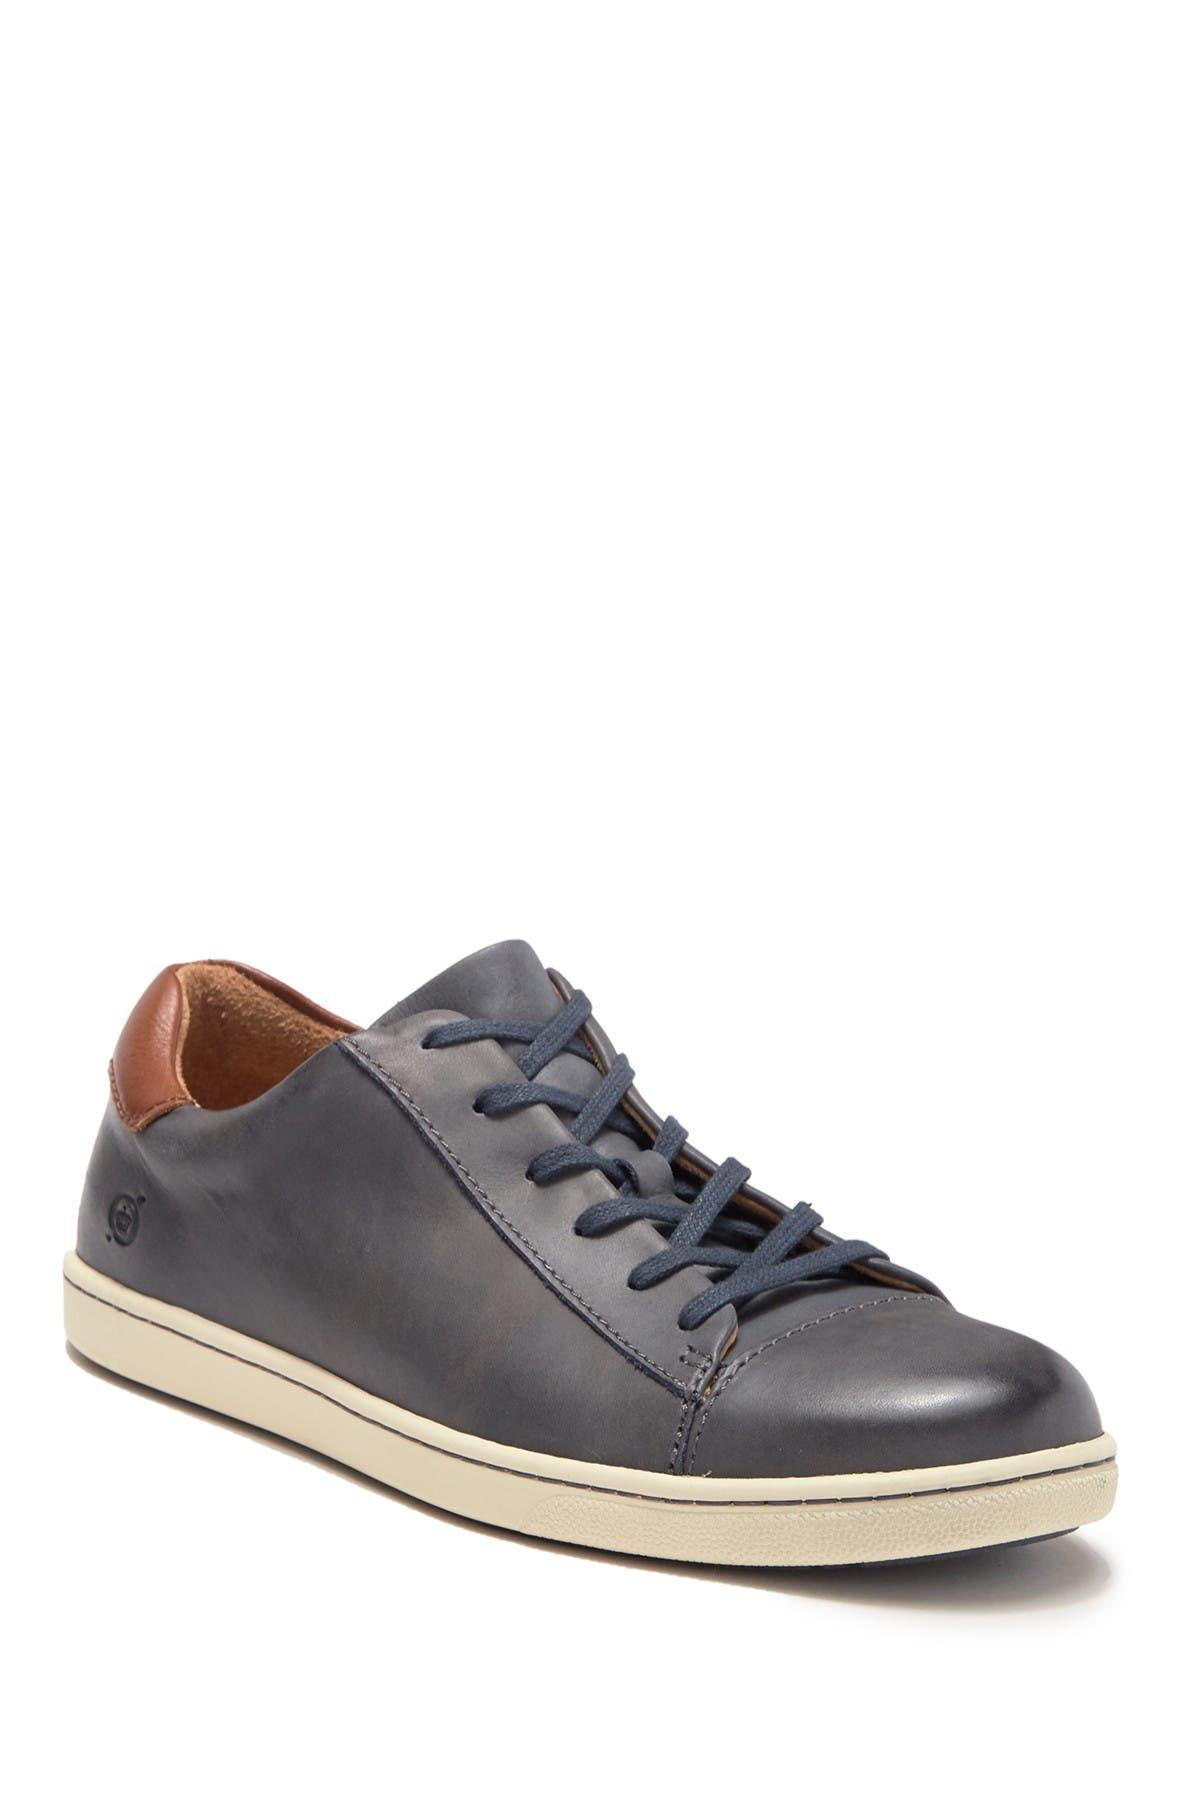 Image of Born Ahsram Leather Sneaker